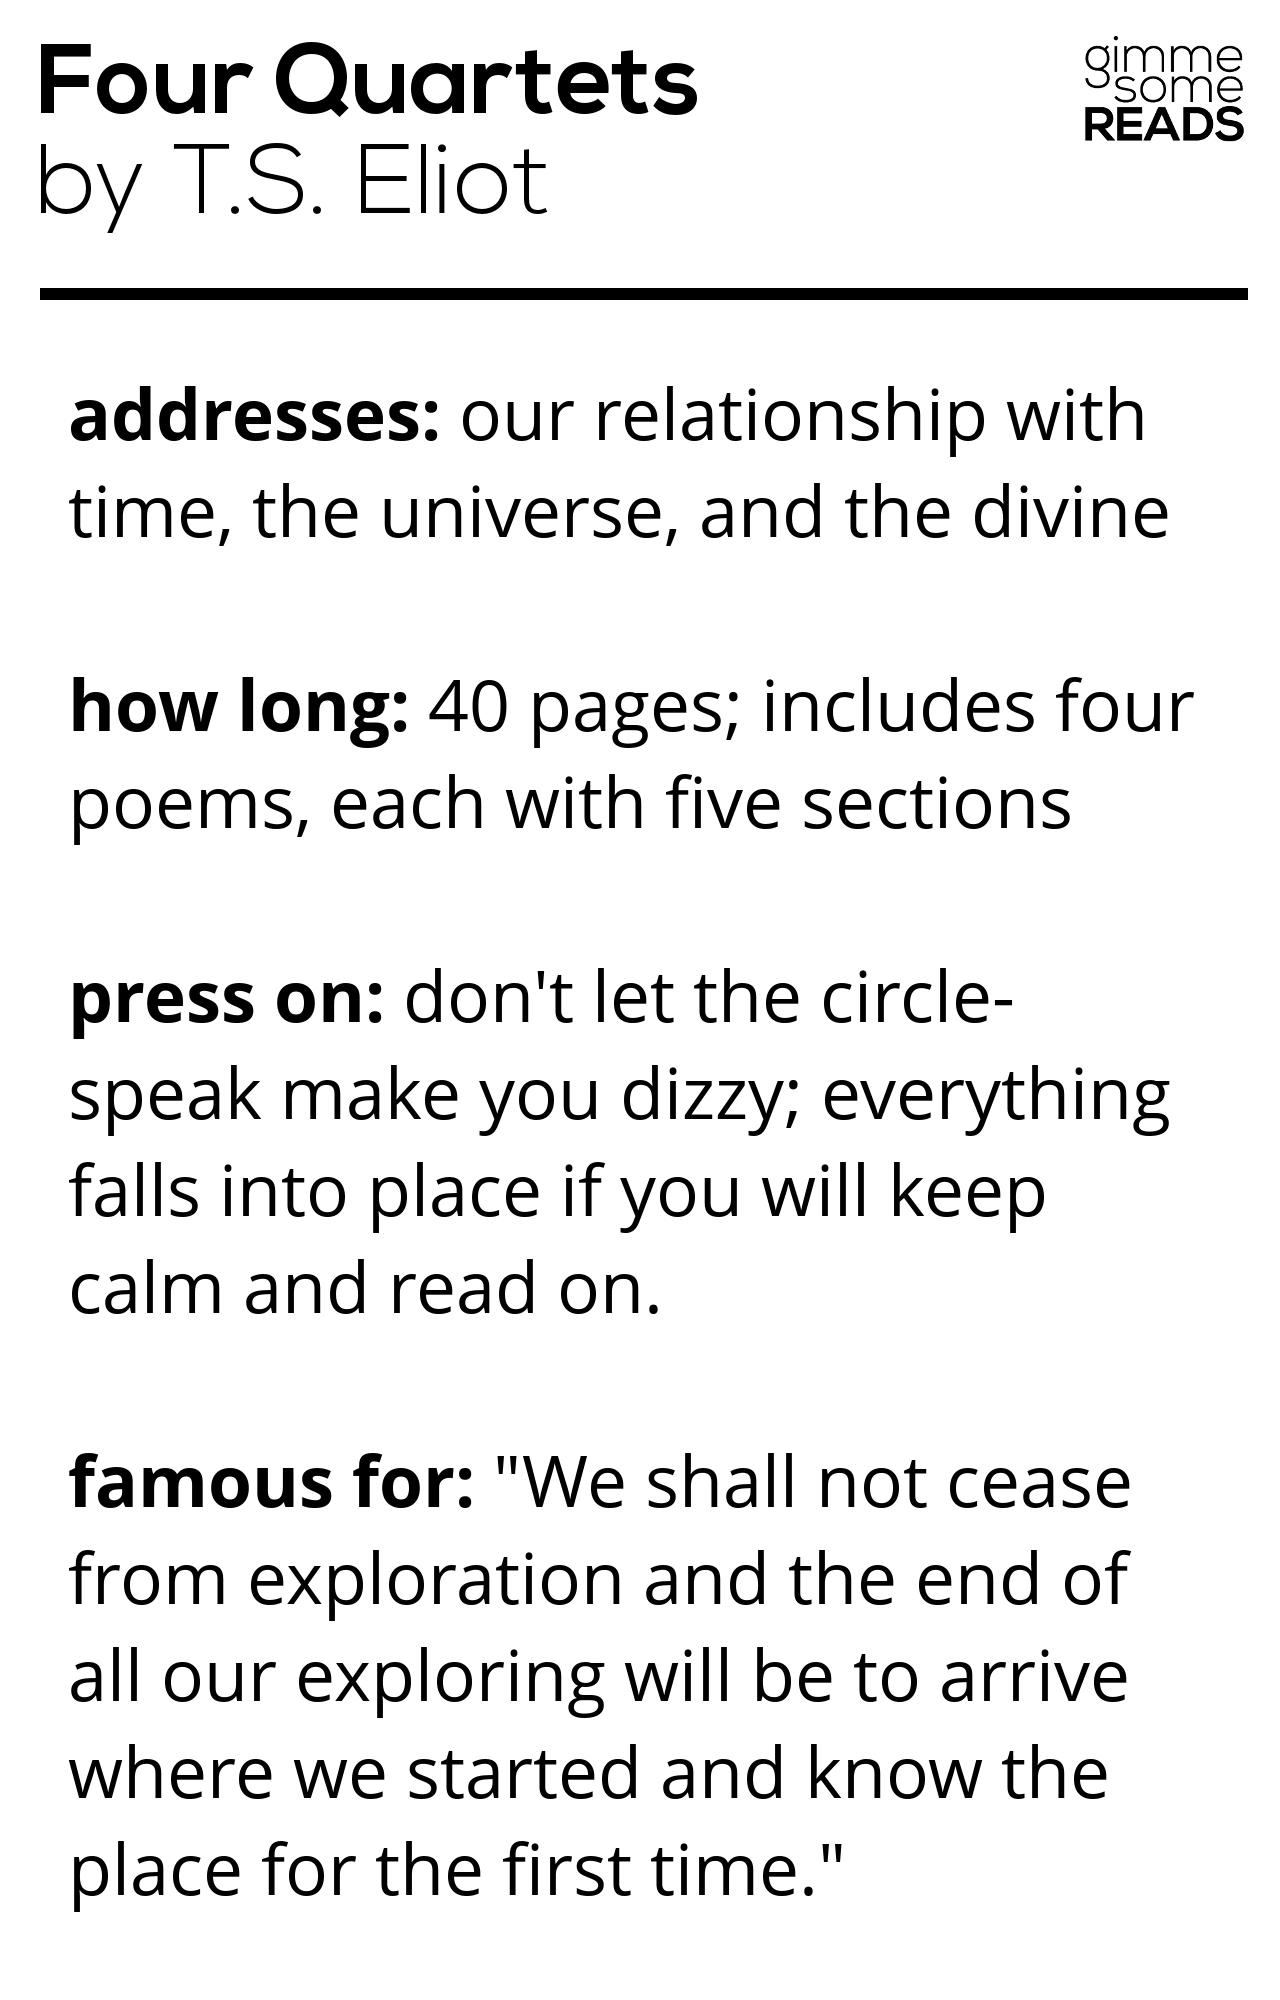 quick read: Four Quartets #TSEliot   gimmesomereads.com